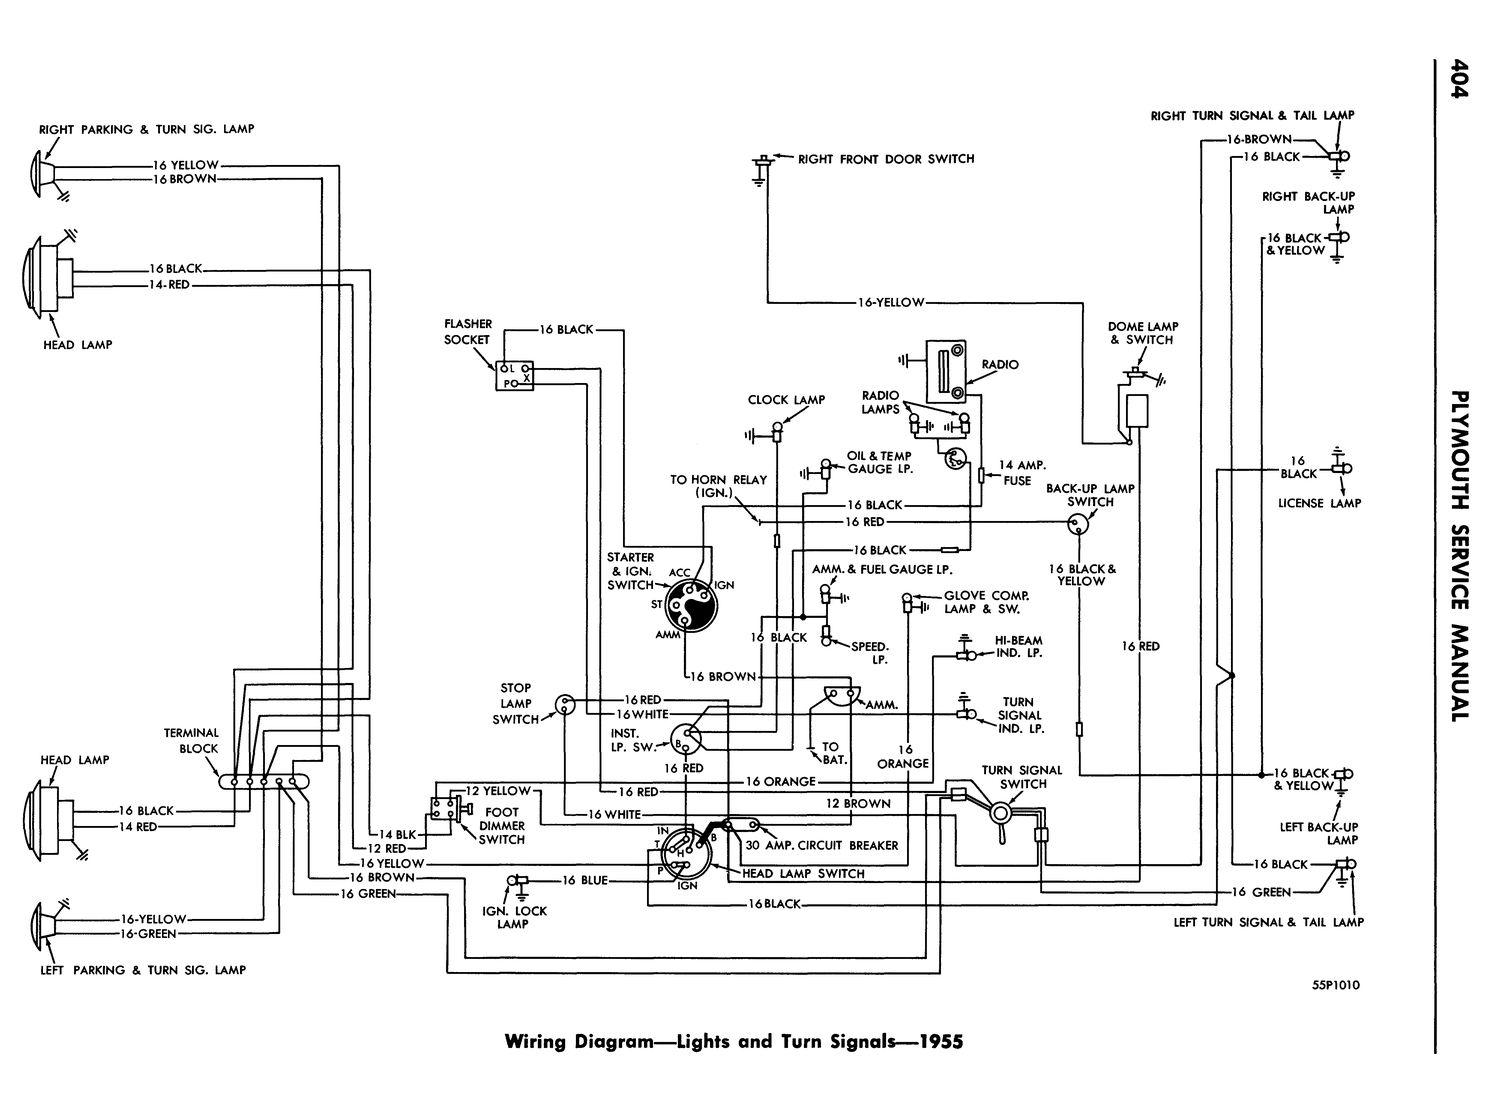 56 plymouth wiring diagram waterway 56 pump wiring diagram